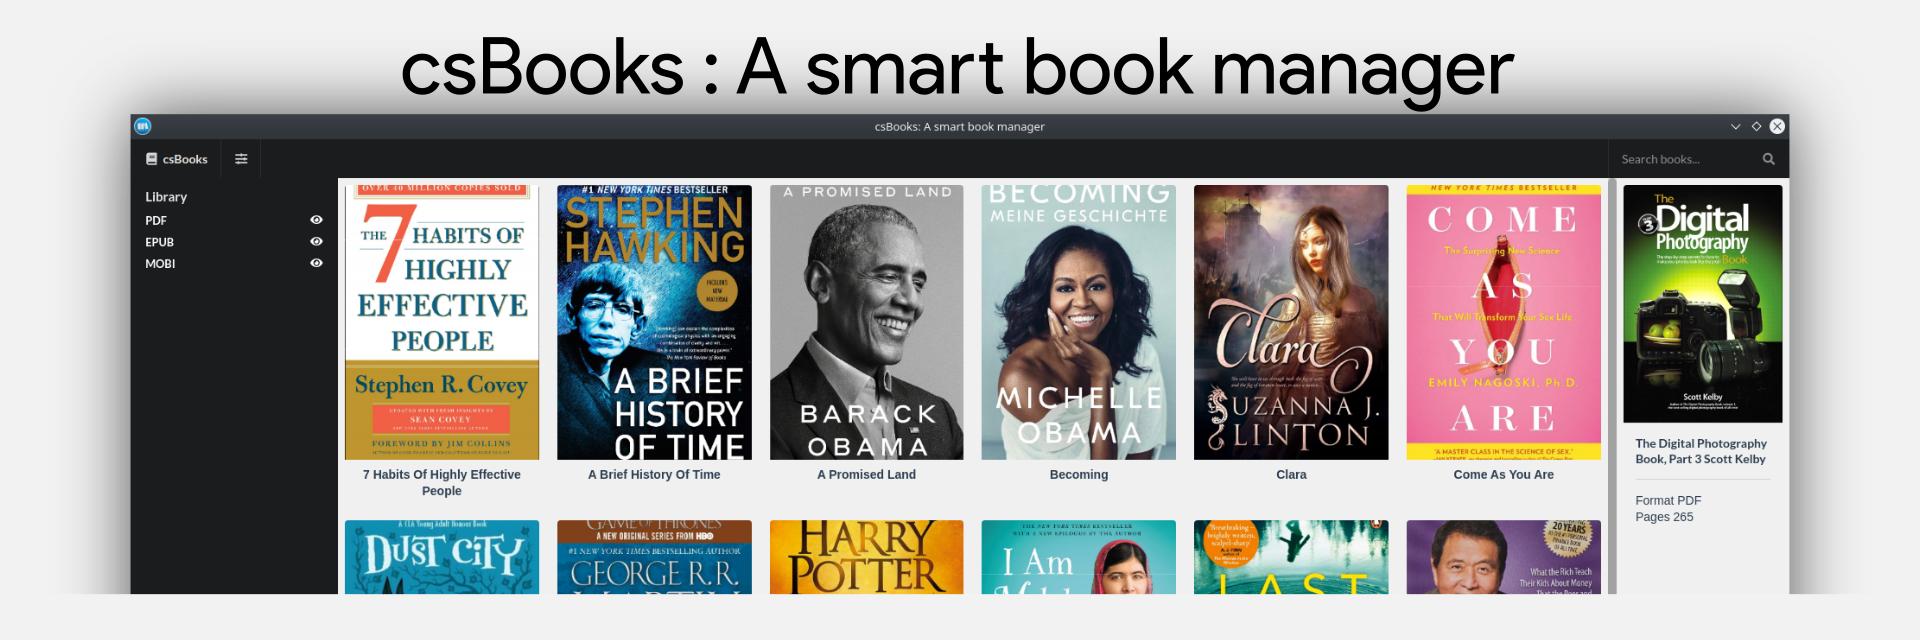 csBooks - A Smart Book Manager banner